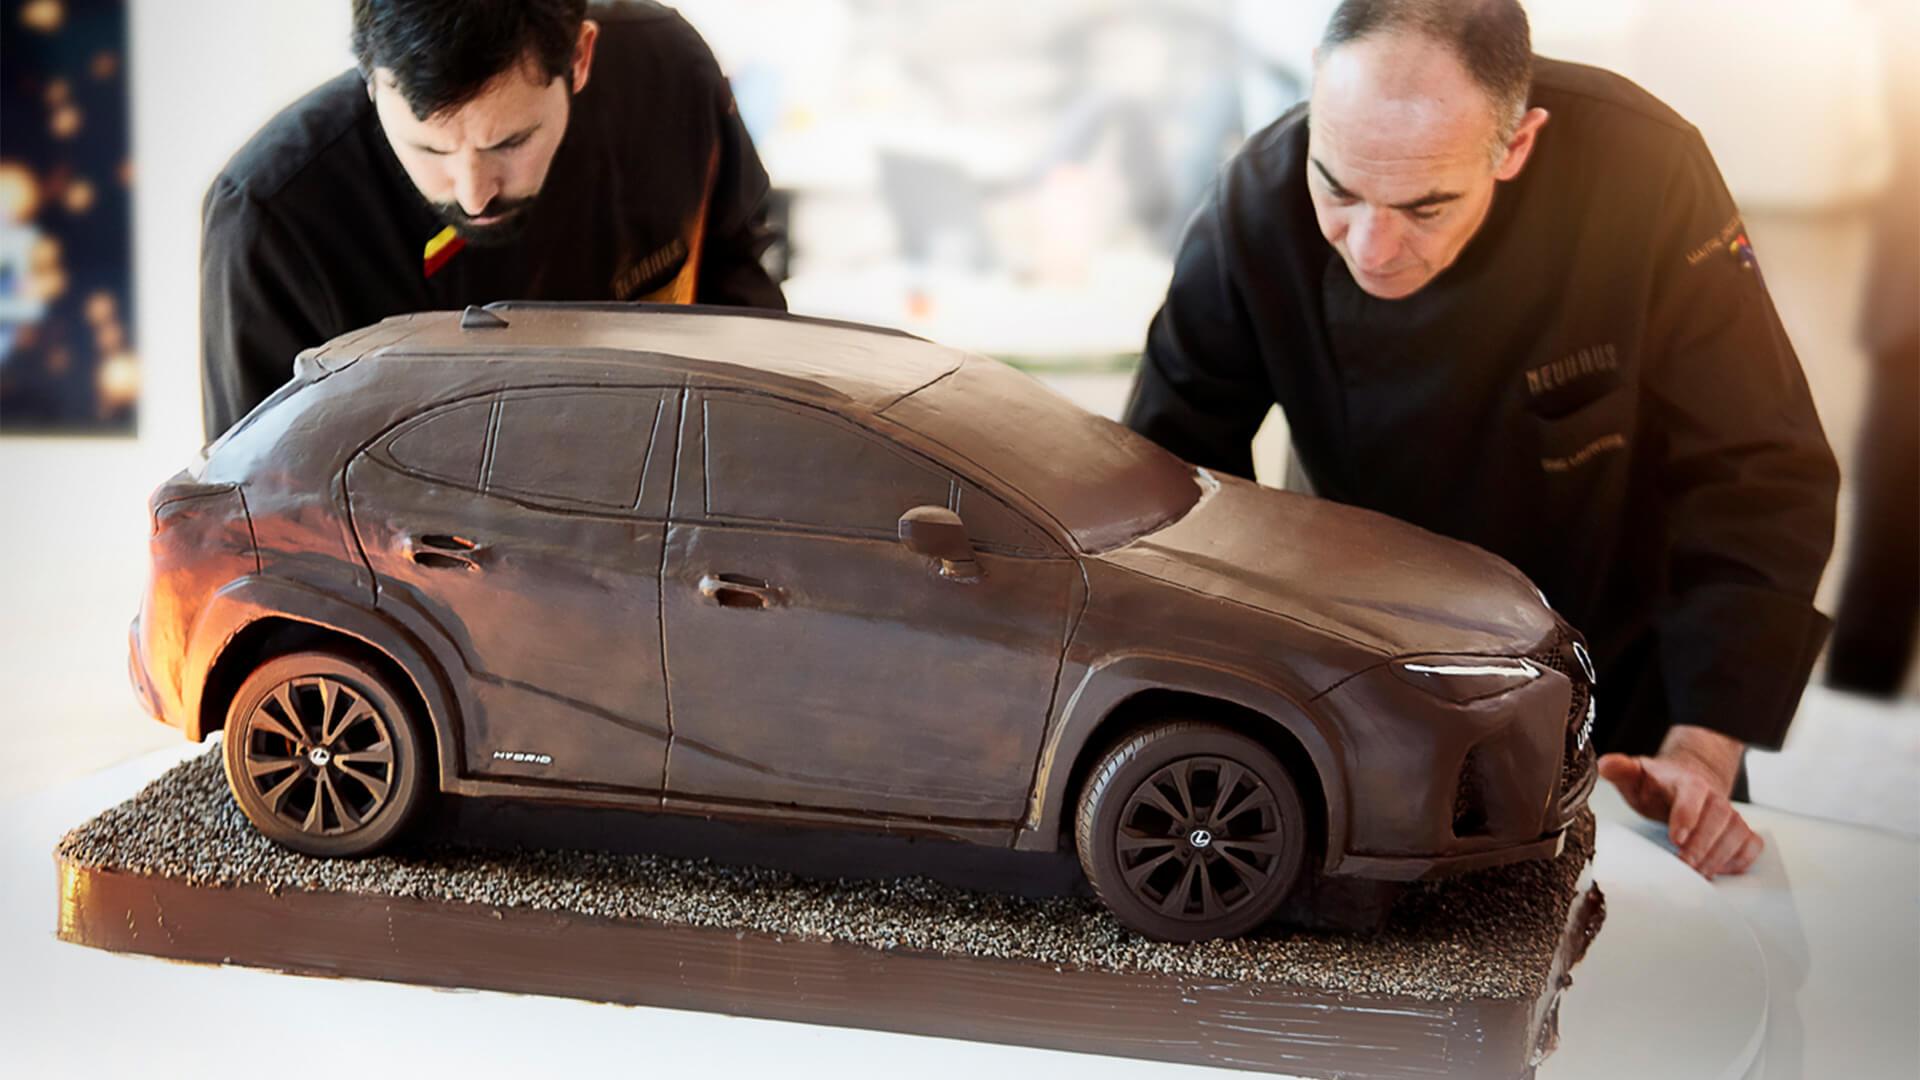 2019 lexus lounge UX Chocolate Car 1920x1080 09